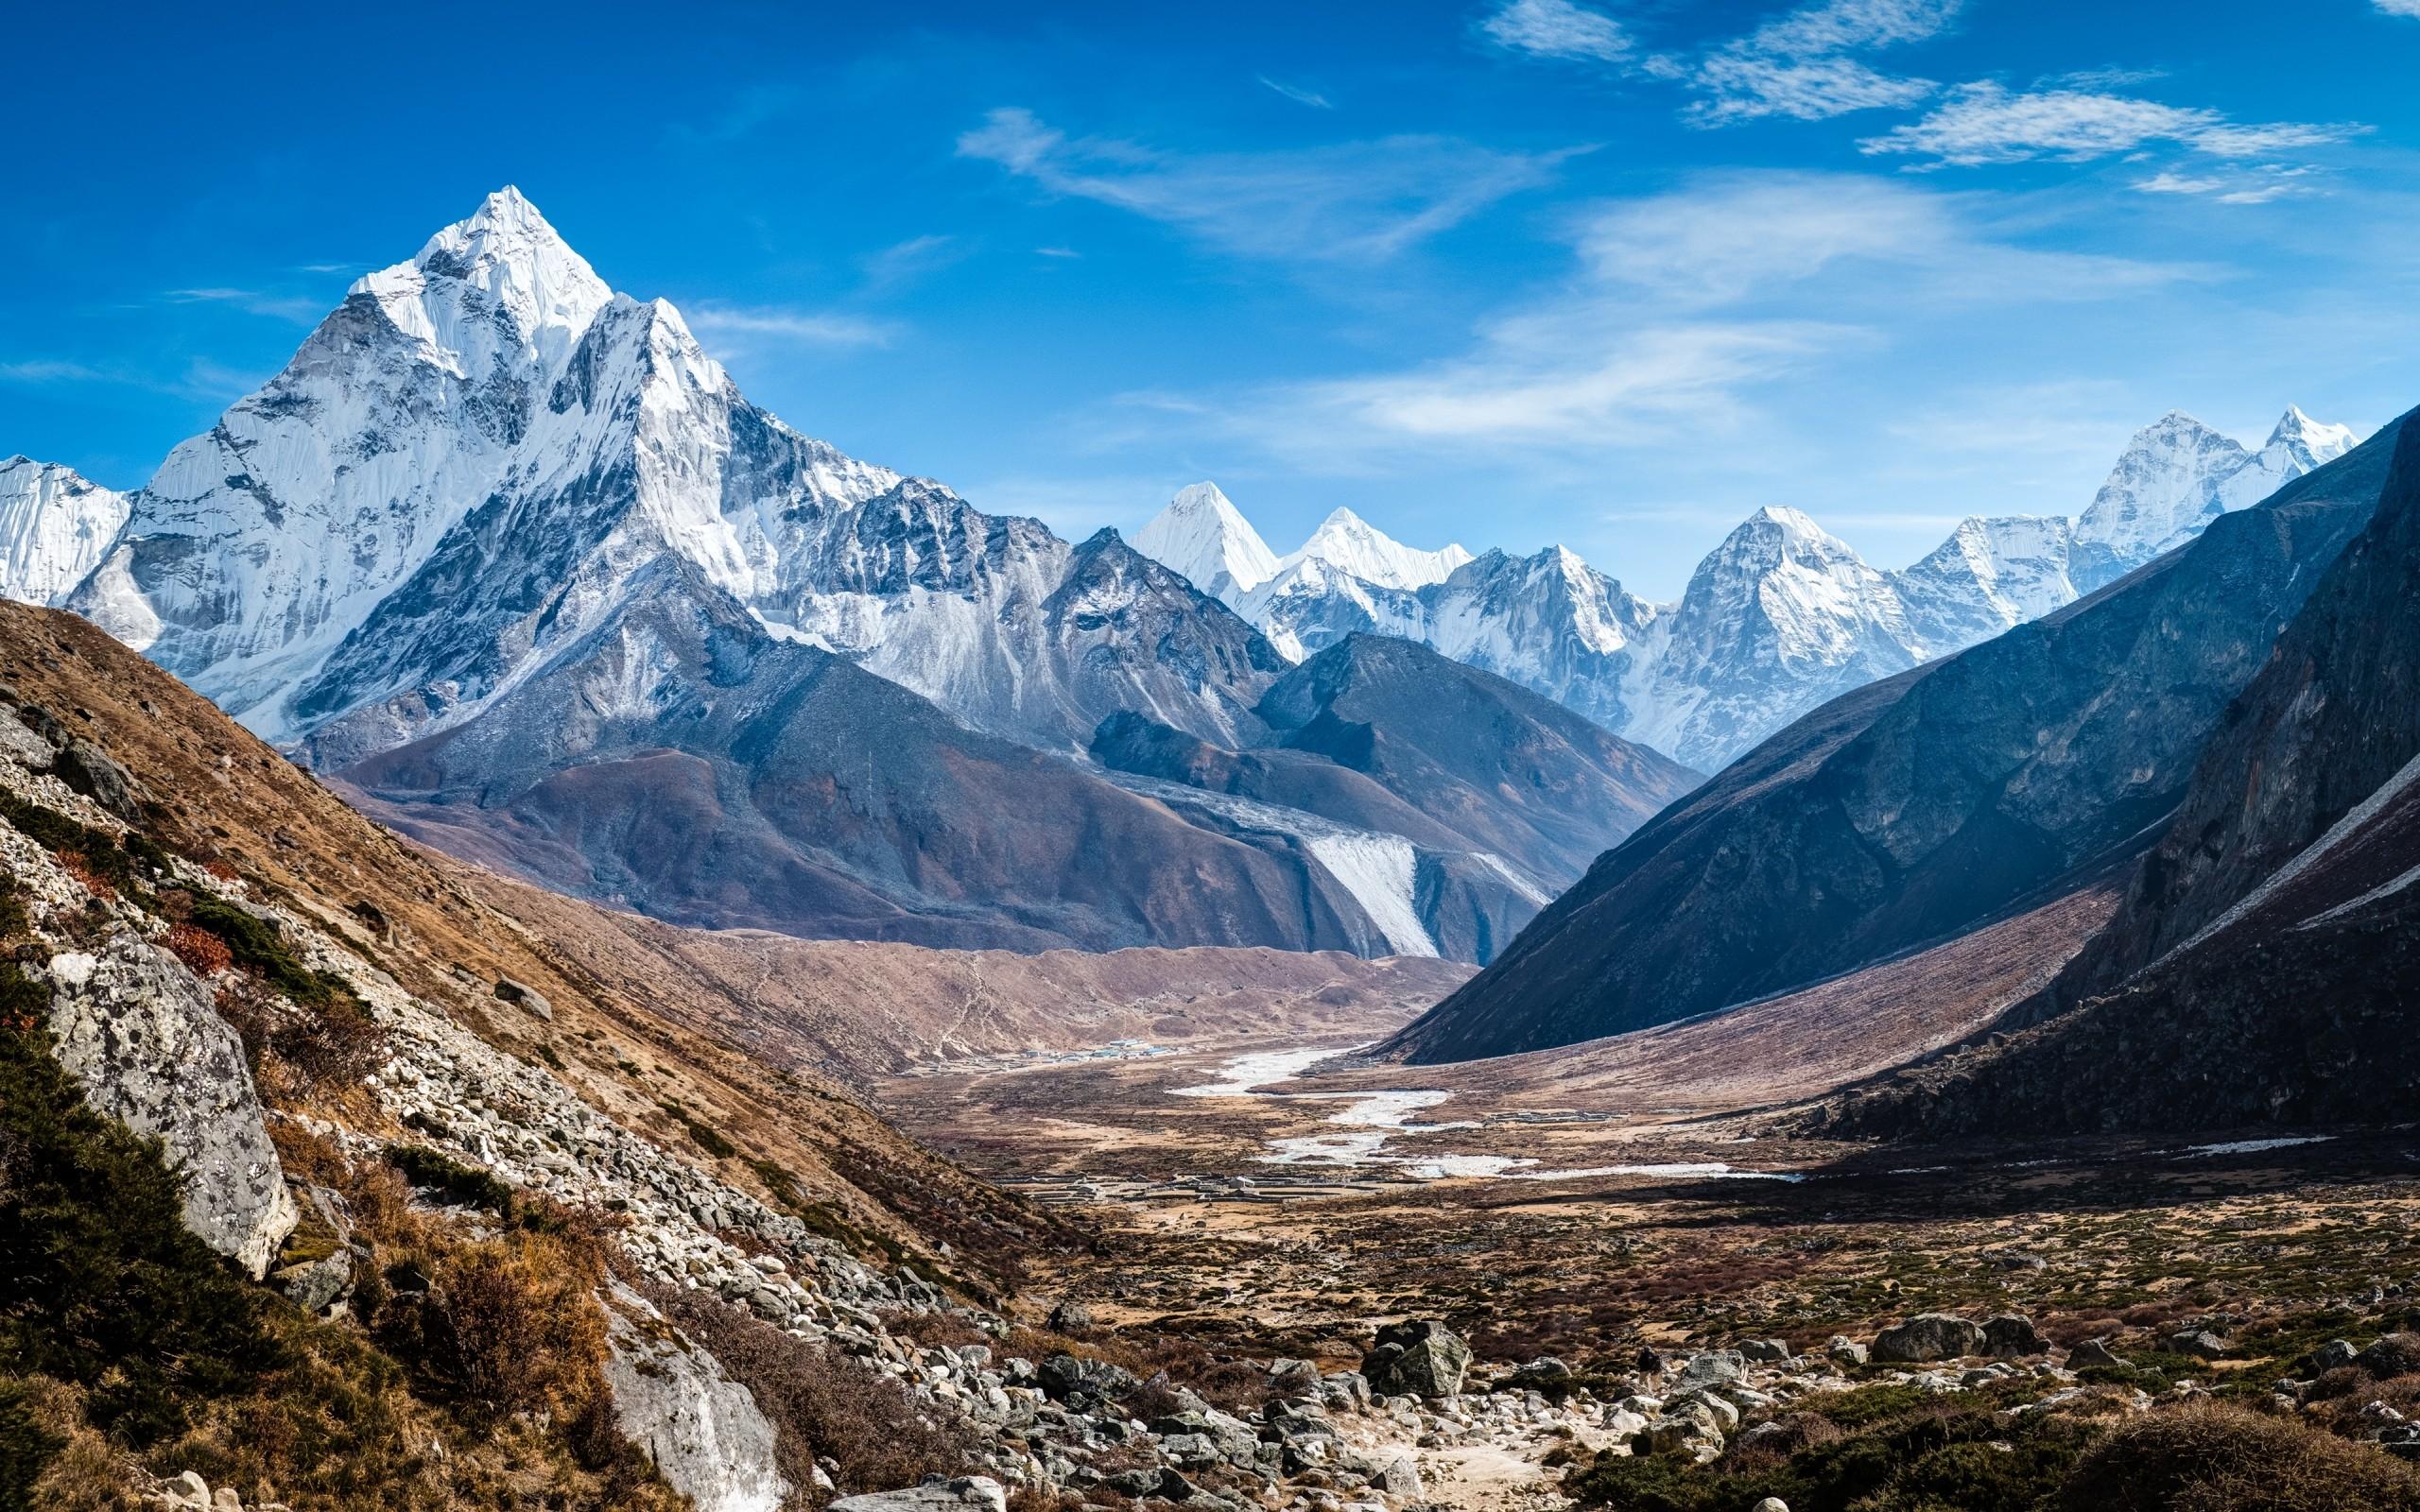 https://blog.travefy.com/wp-content/uploads/2015/07/nepal-mountains.jpg